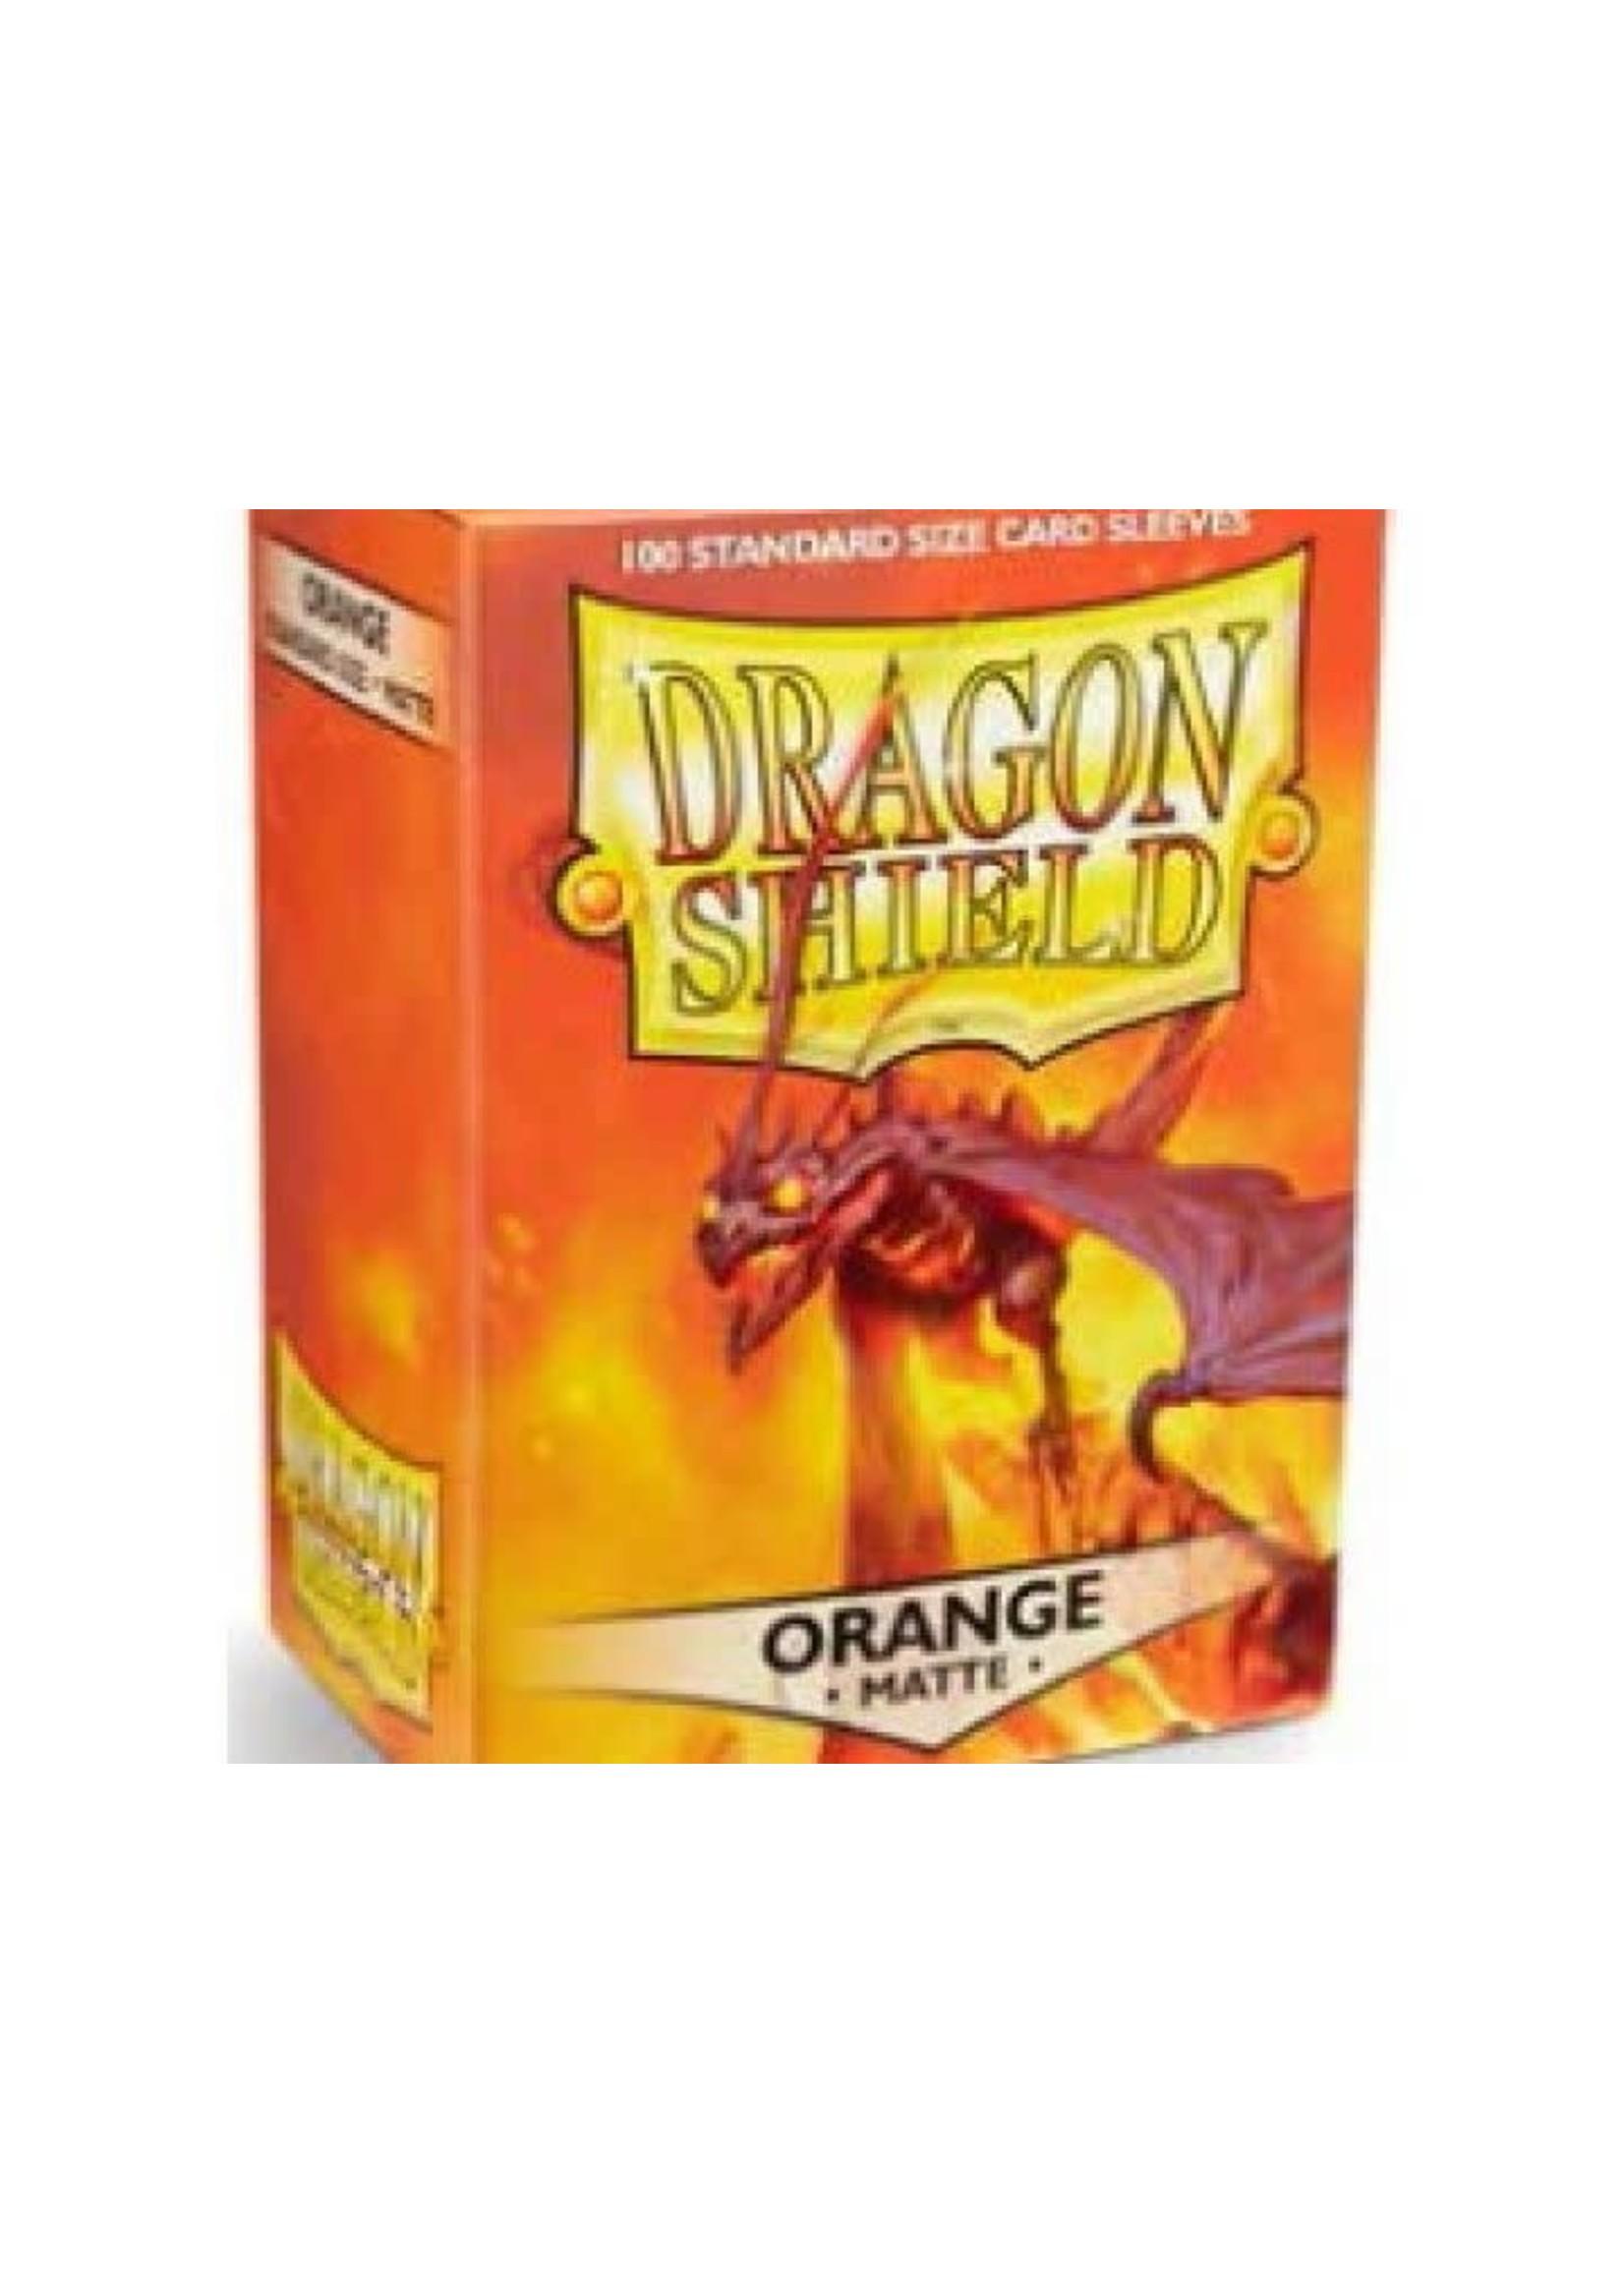 Dragonshield Orange Matte (100Pcs)